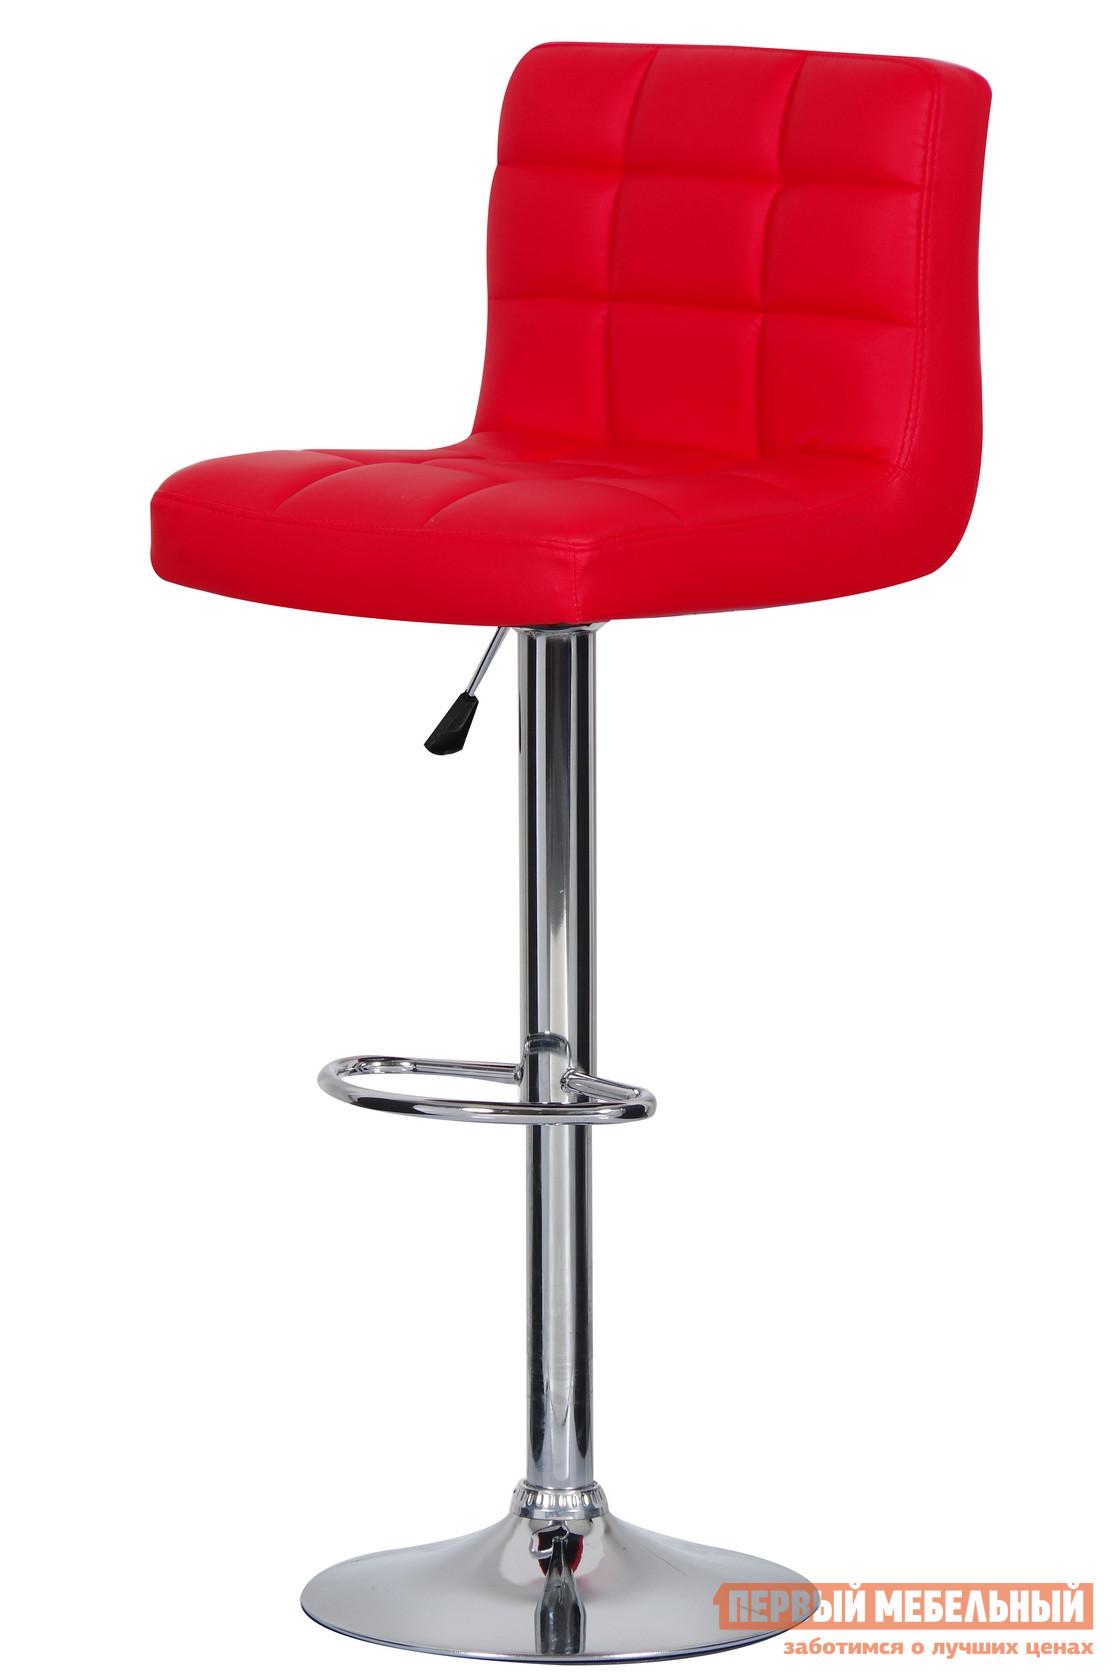 Барный стул Паоли Kruger Original T-808H paoli opus